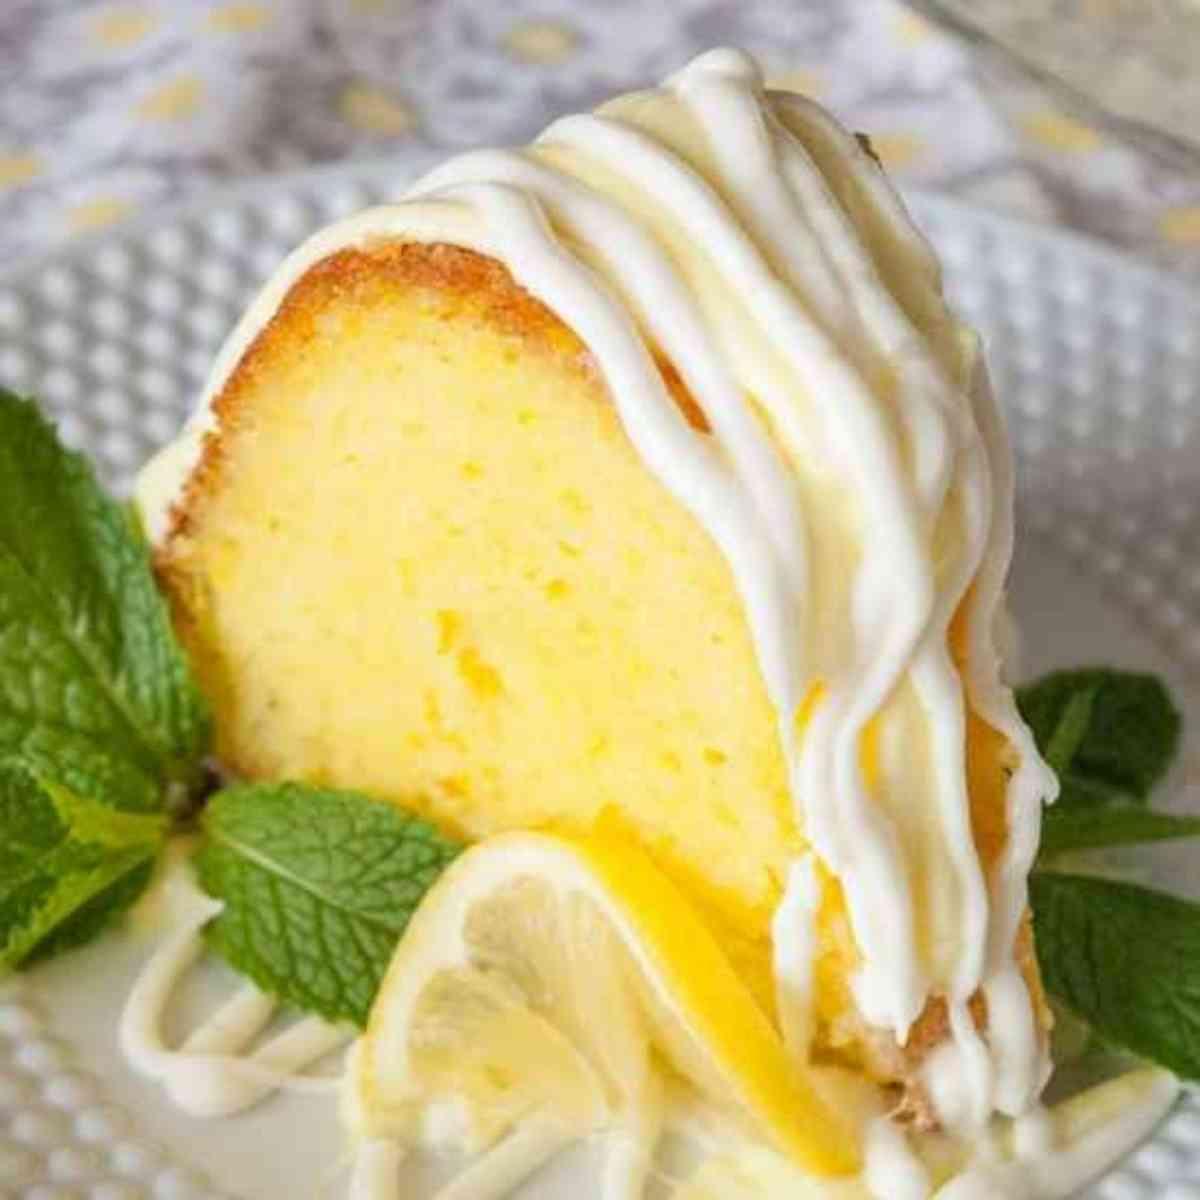 Slice of lemon bundt cake on a plate.